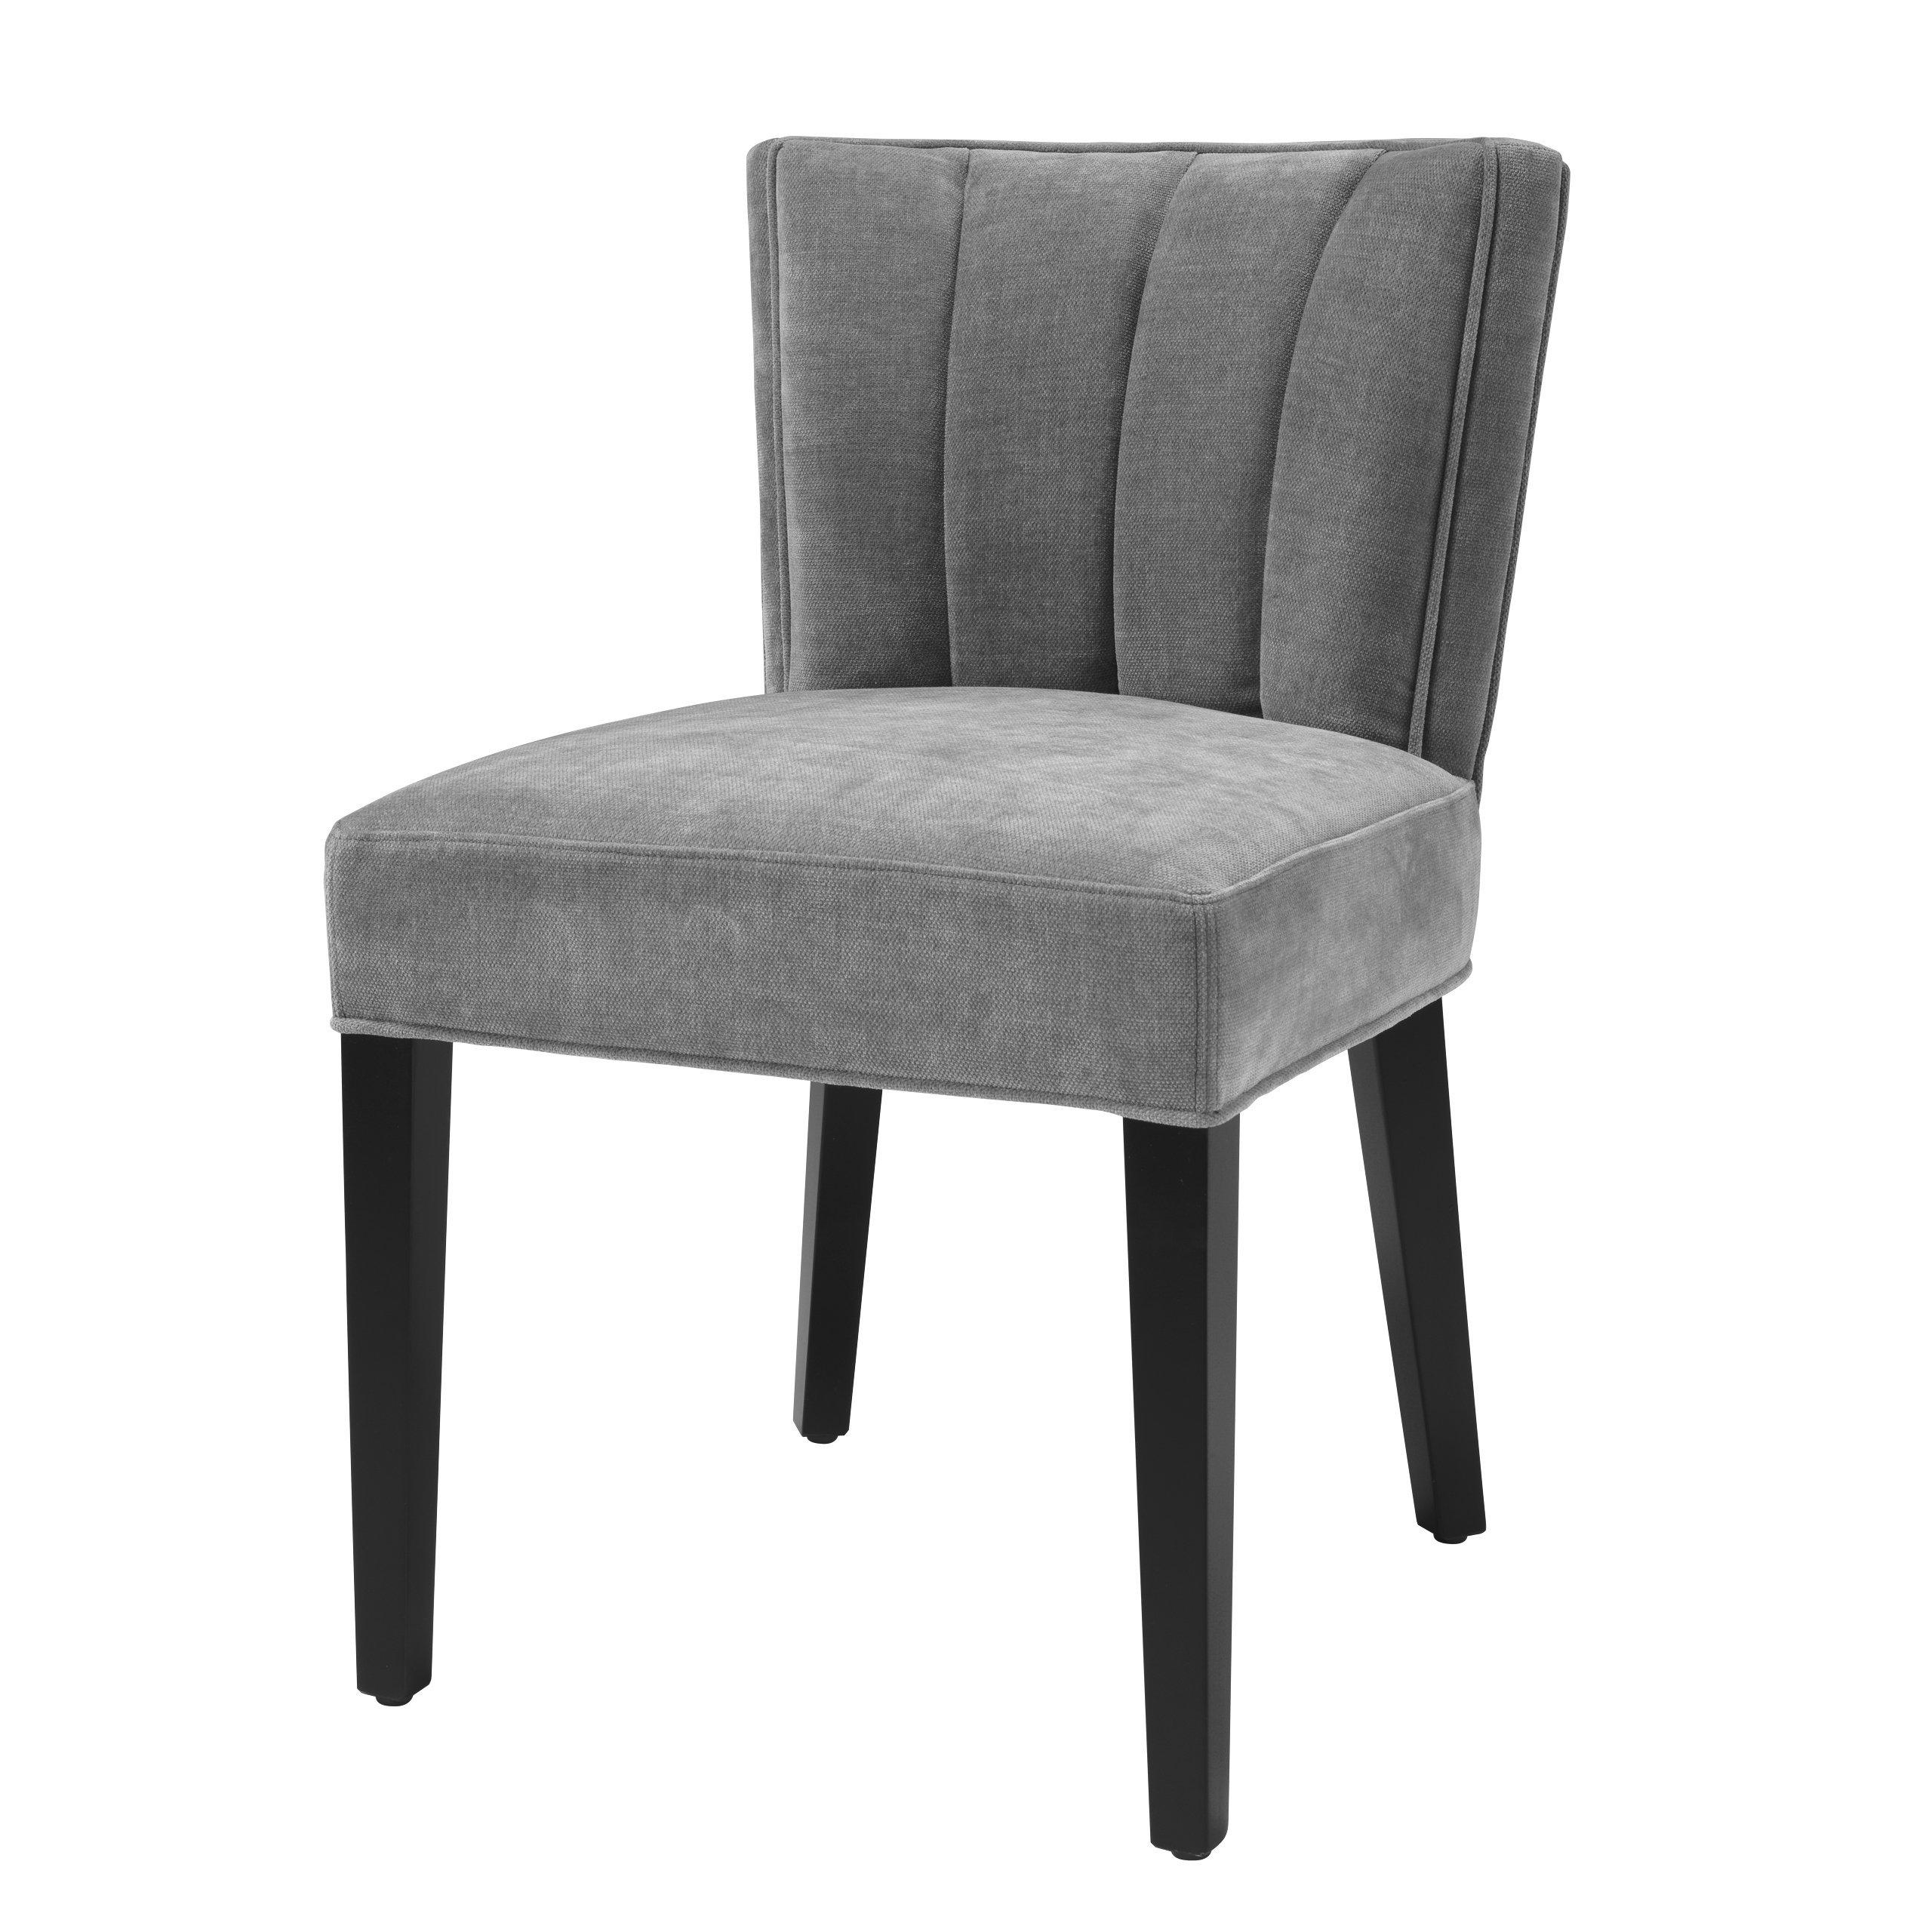 image-Eichholtz Dining Chair Windhaven clarck grey